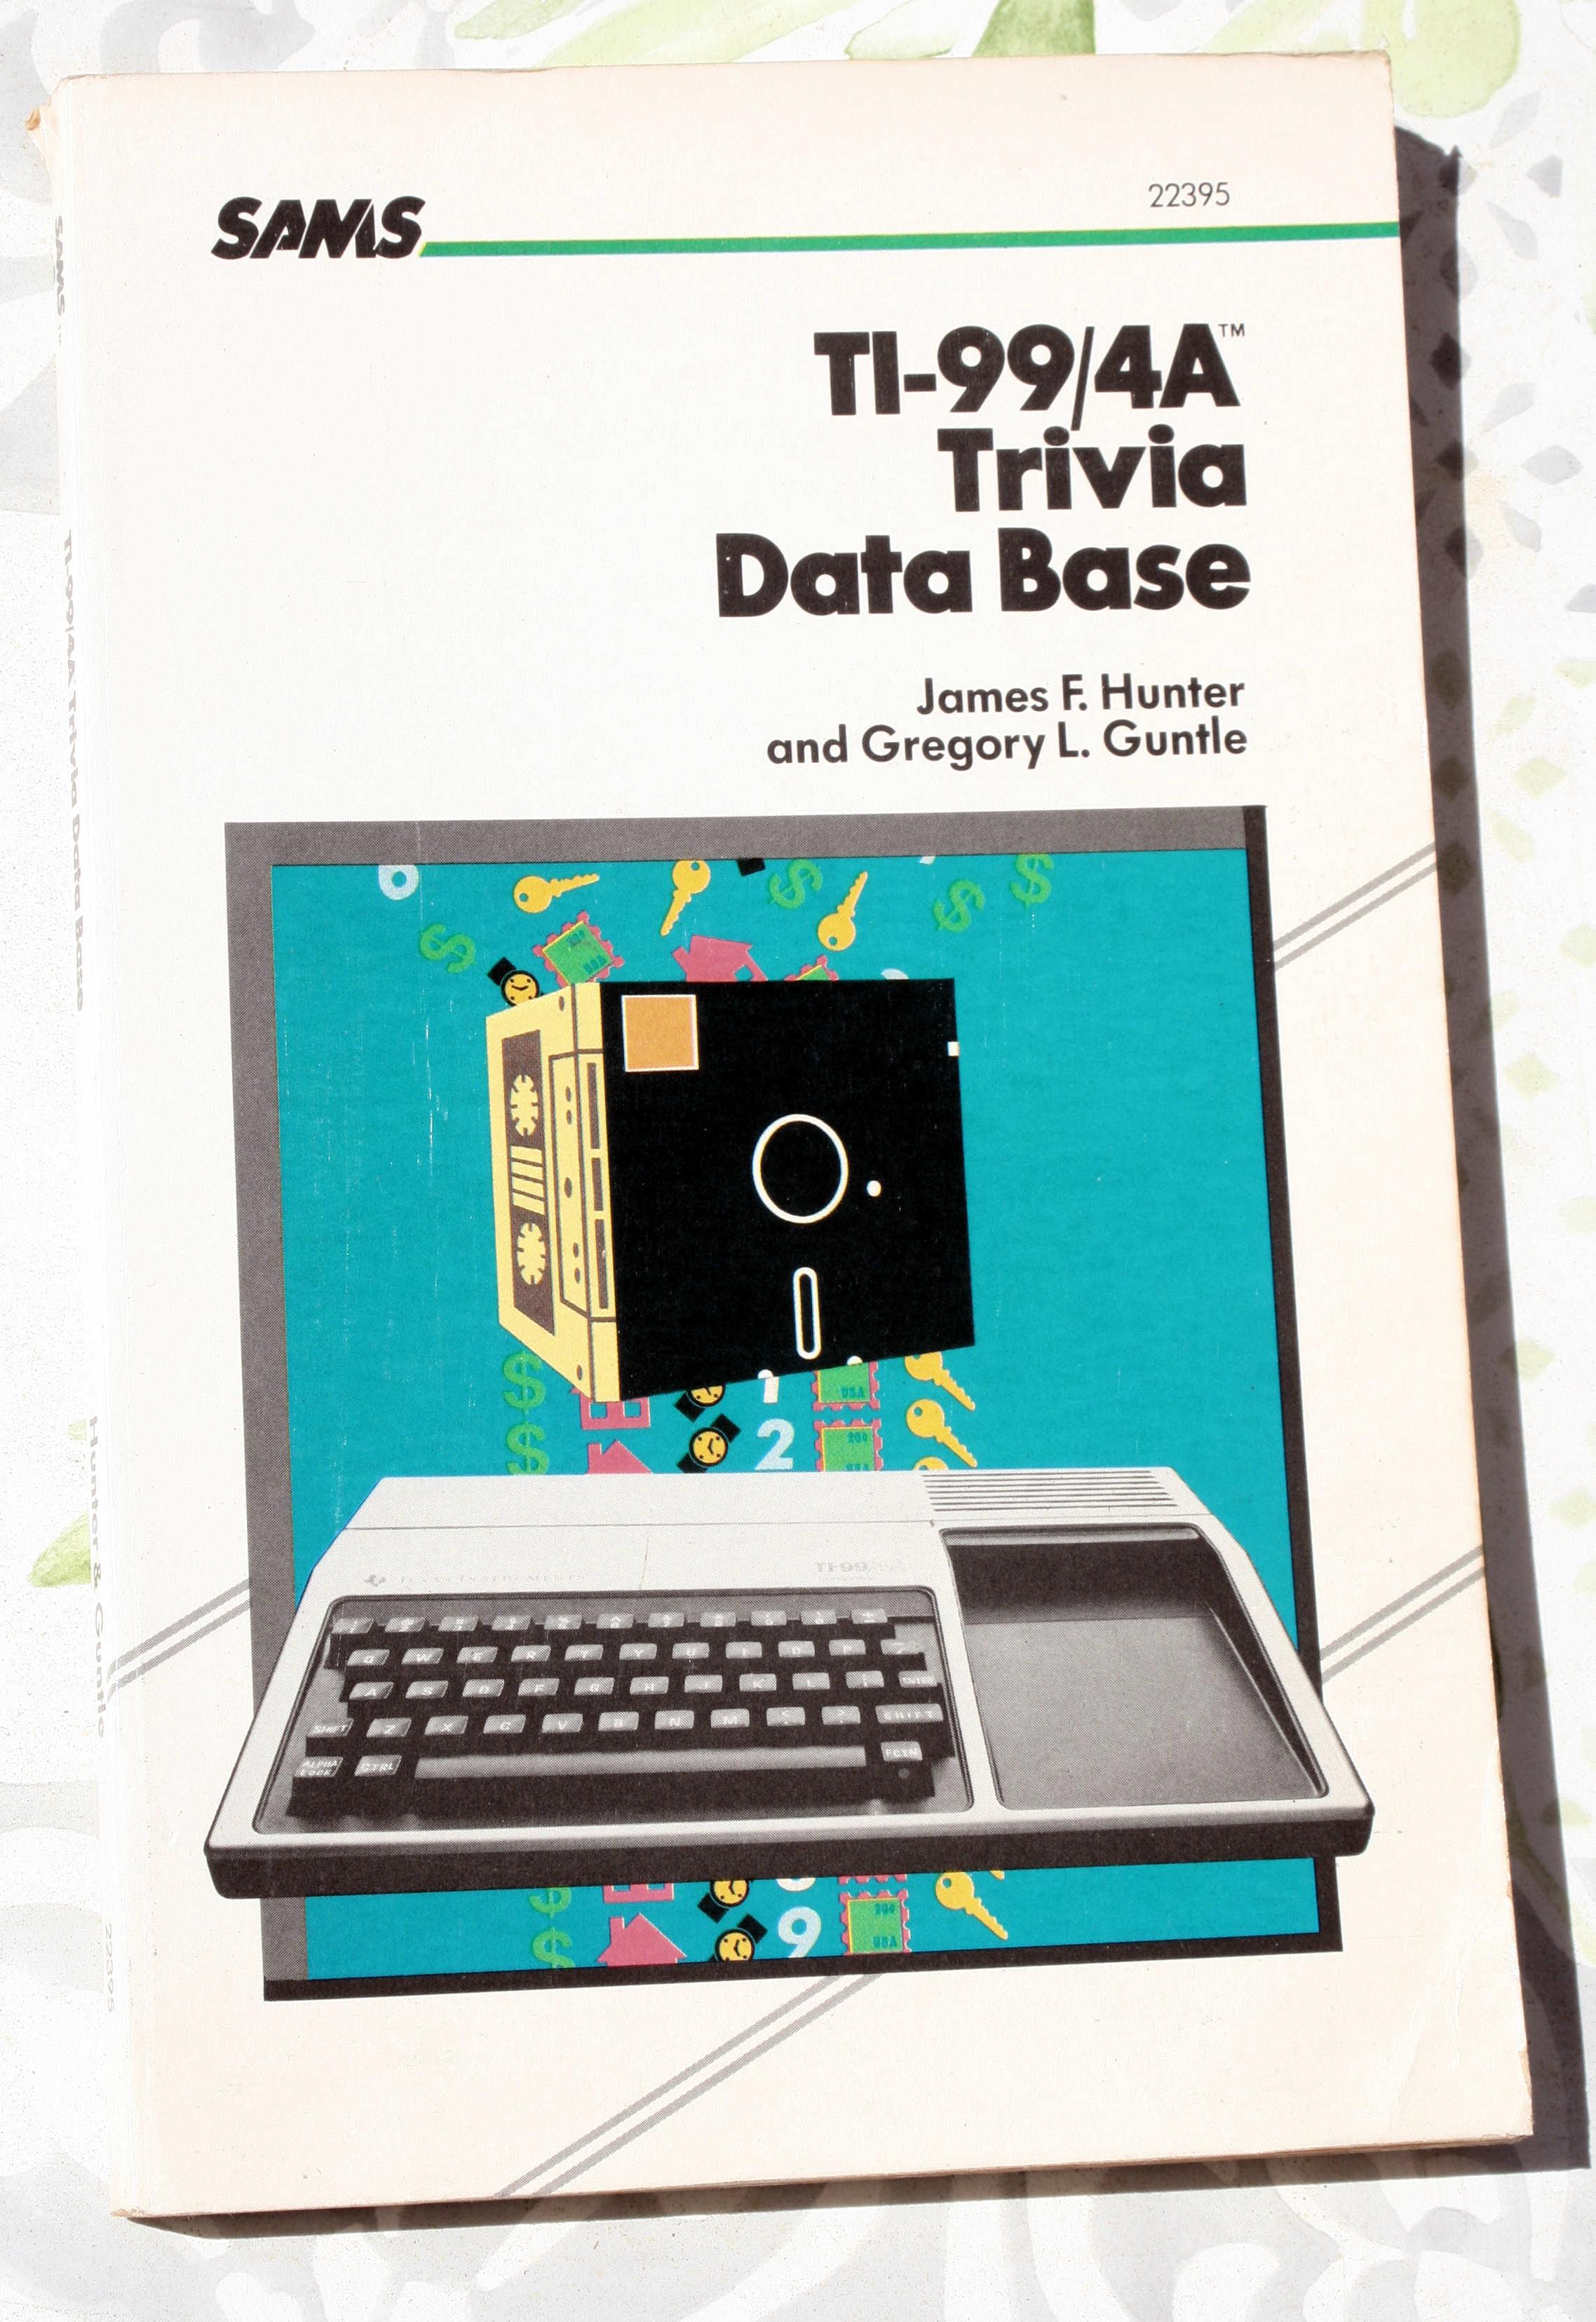 Trivia Data Base